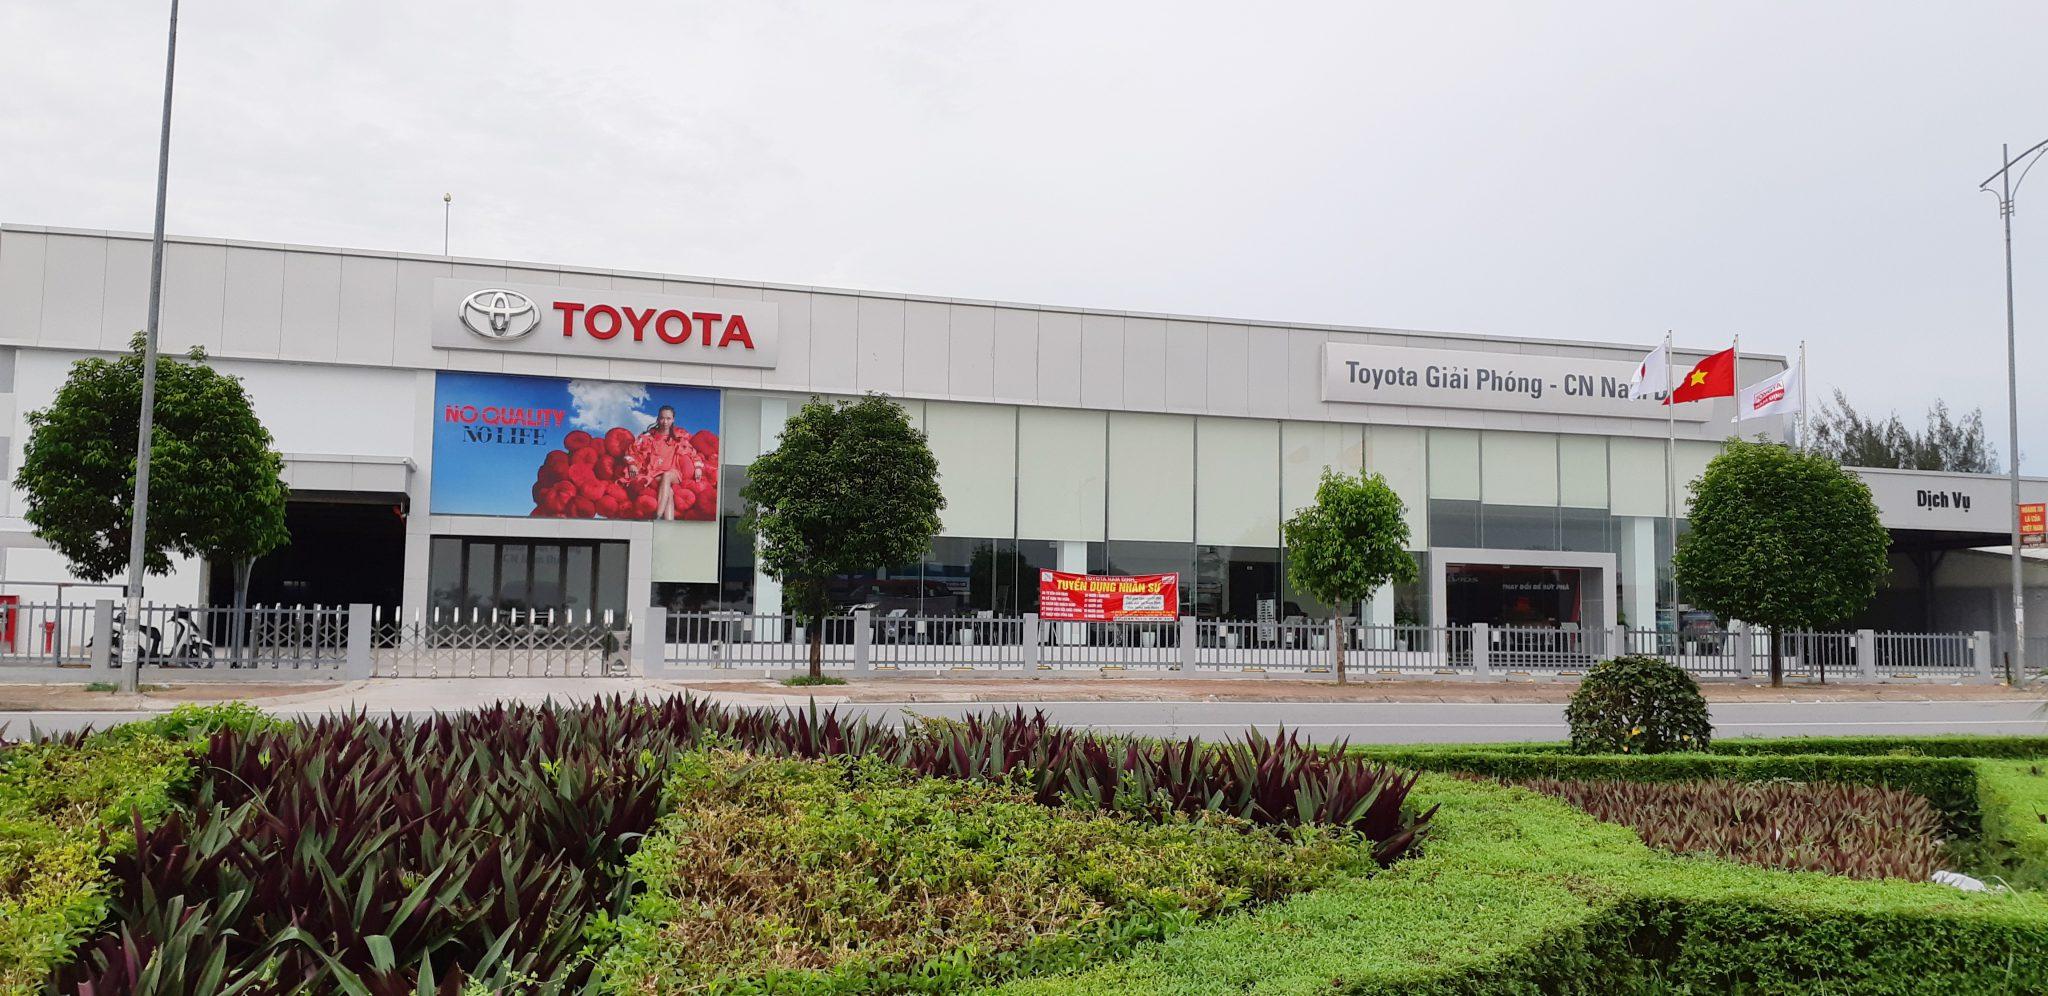 toyota giai phong - Giới thiệu Toyota Việt Nam